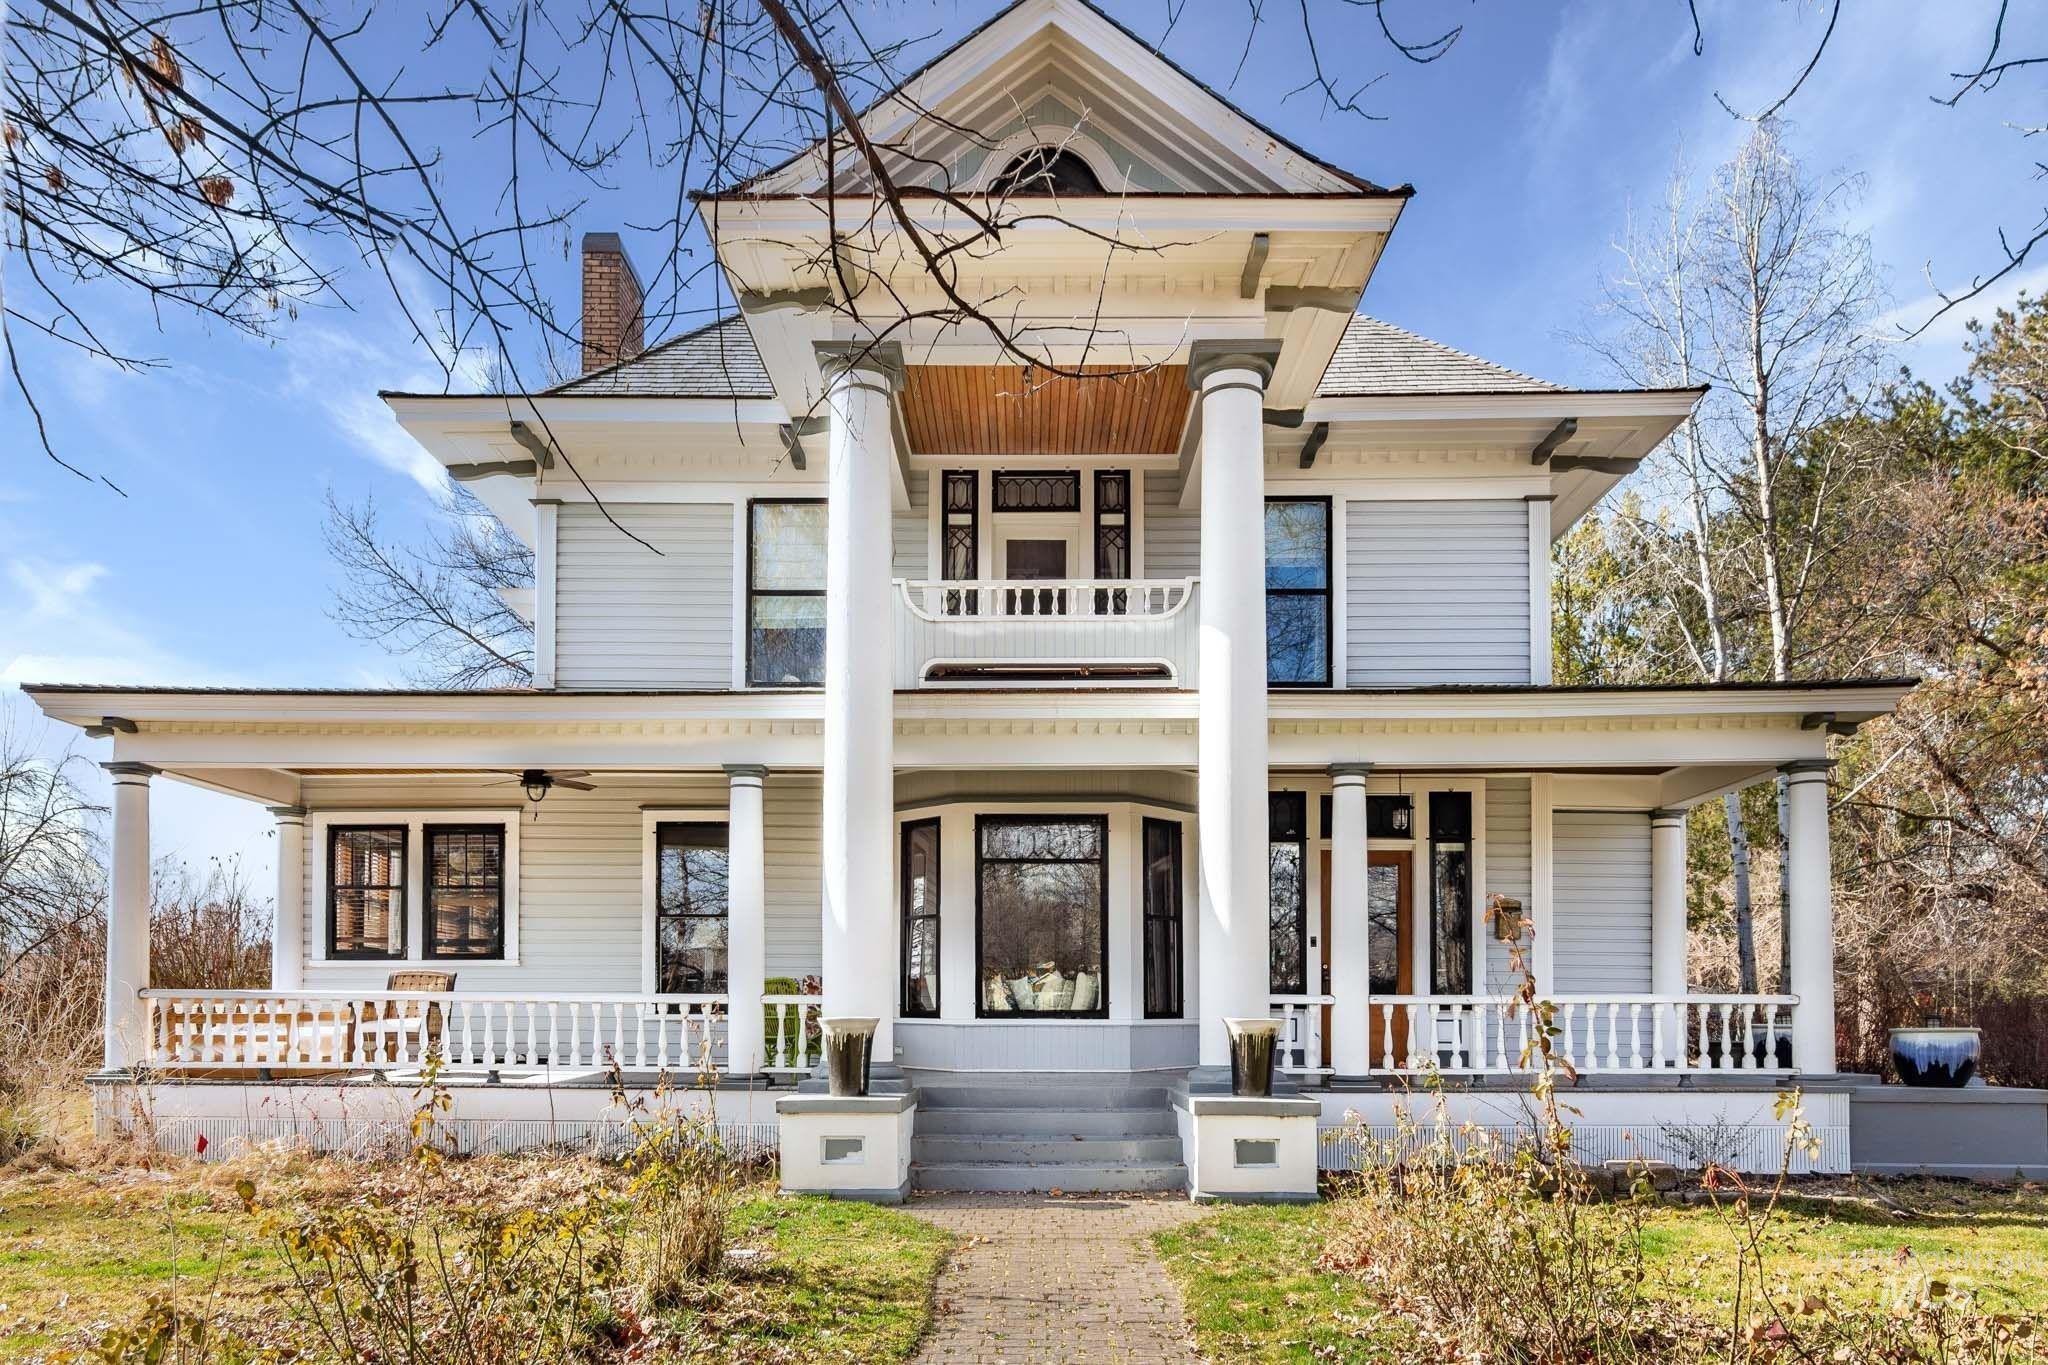 Boise Se- 0300 Real Estate Listings Main Image